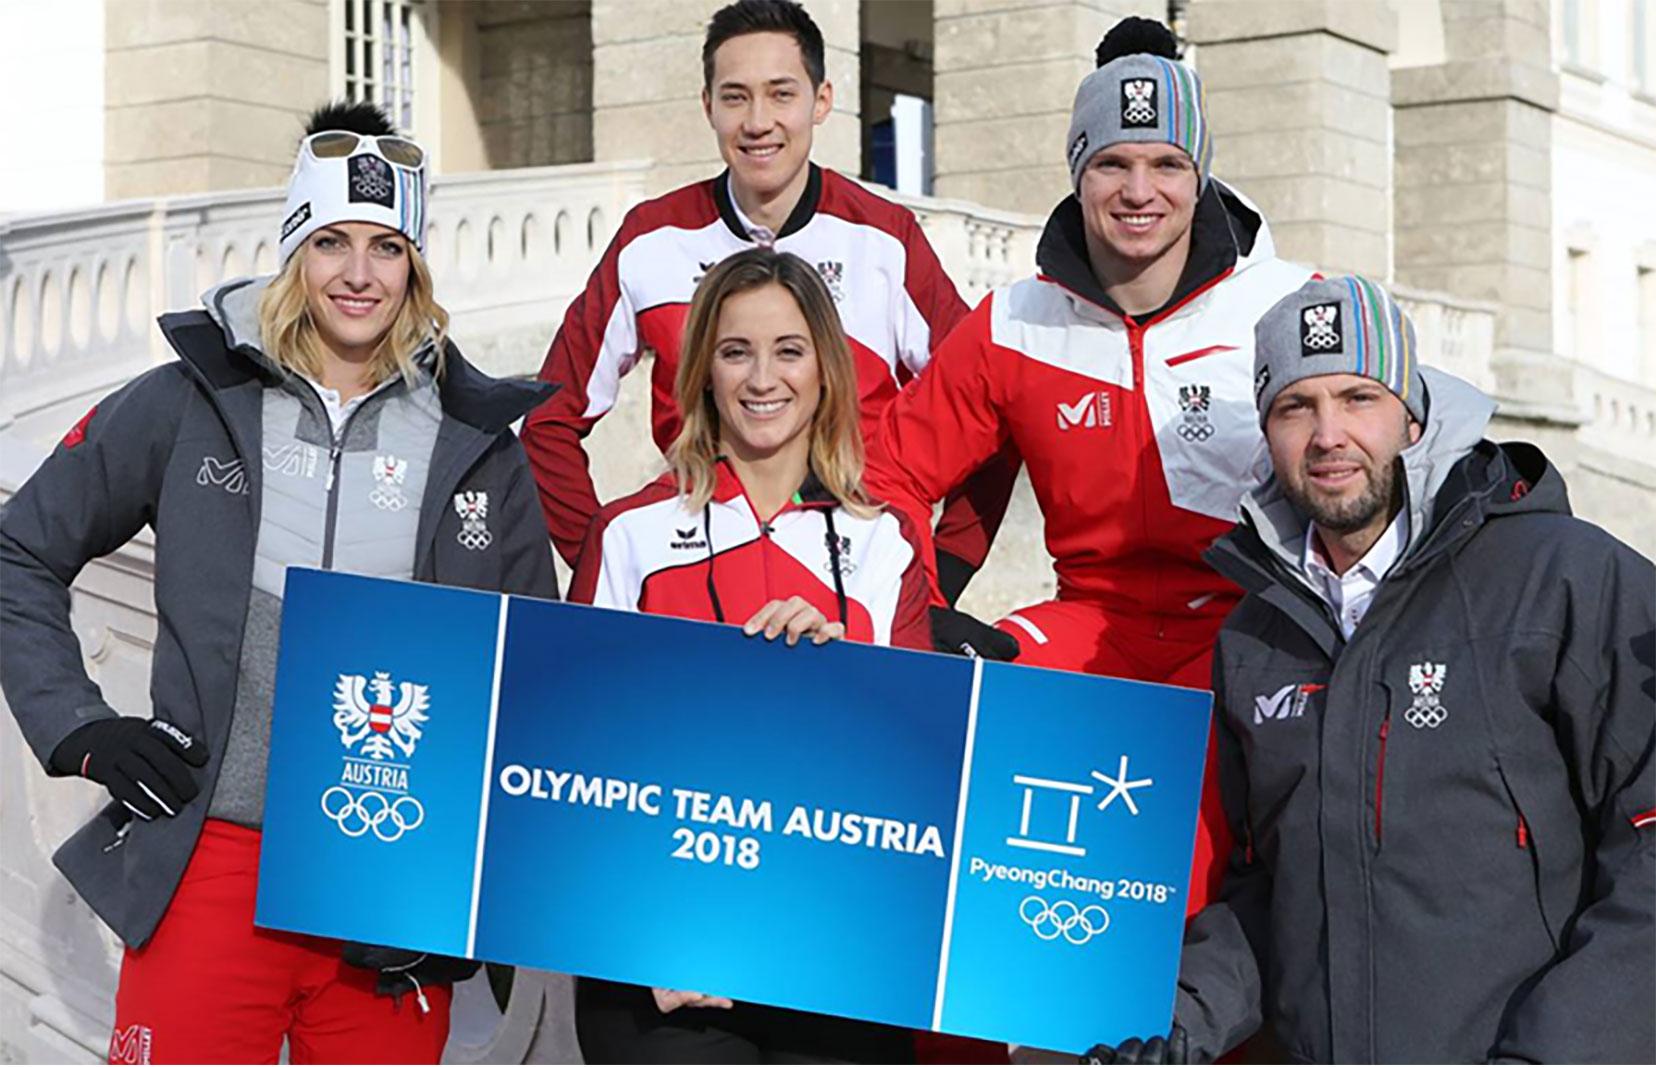 Eisbär Offizieller Ausstatter des Olympiateams